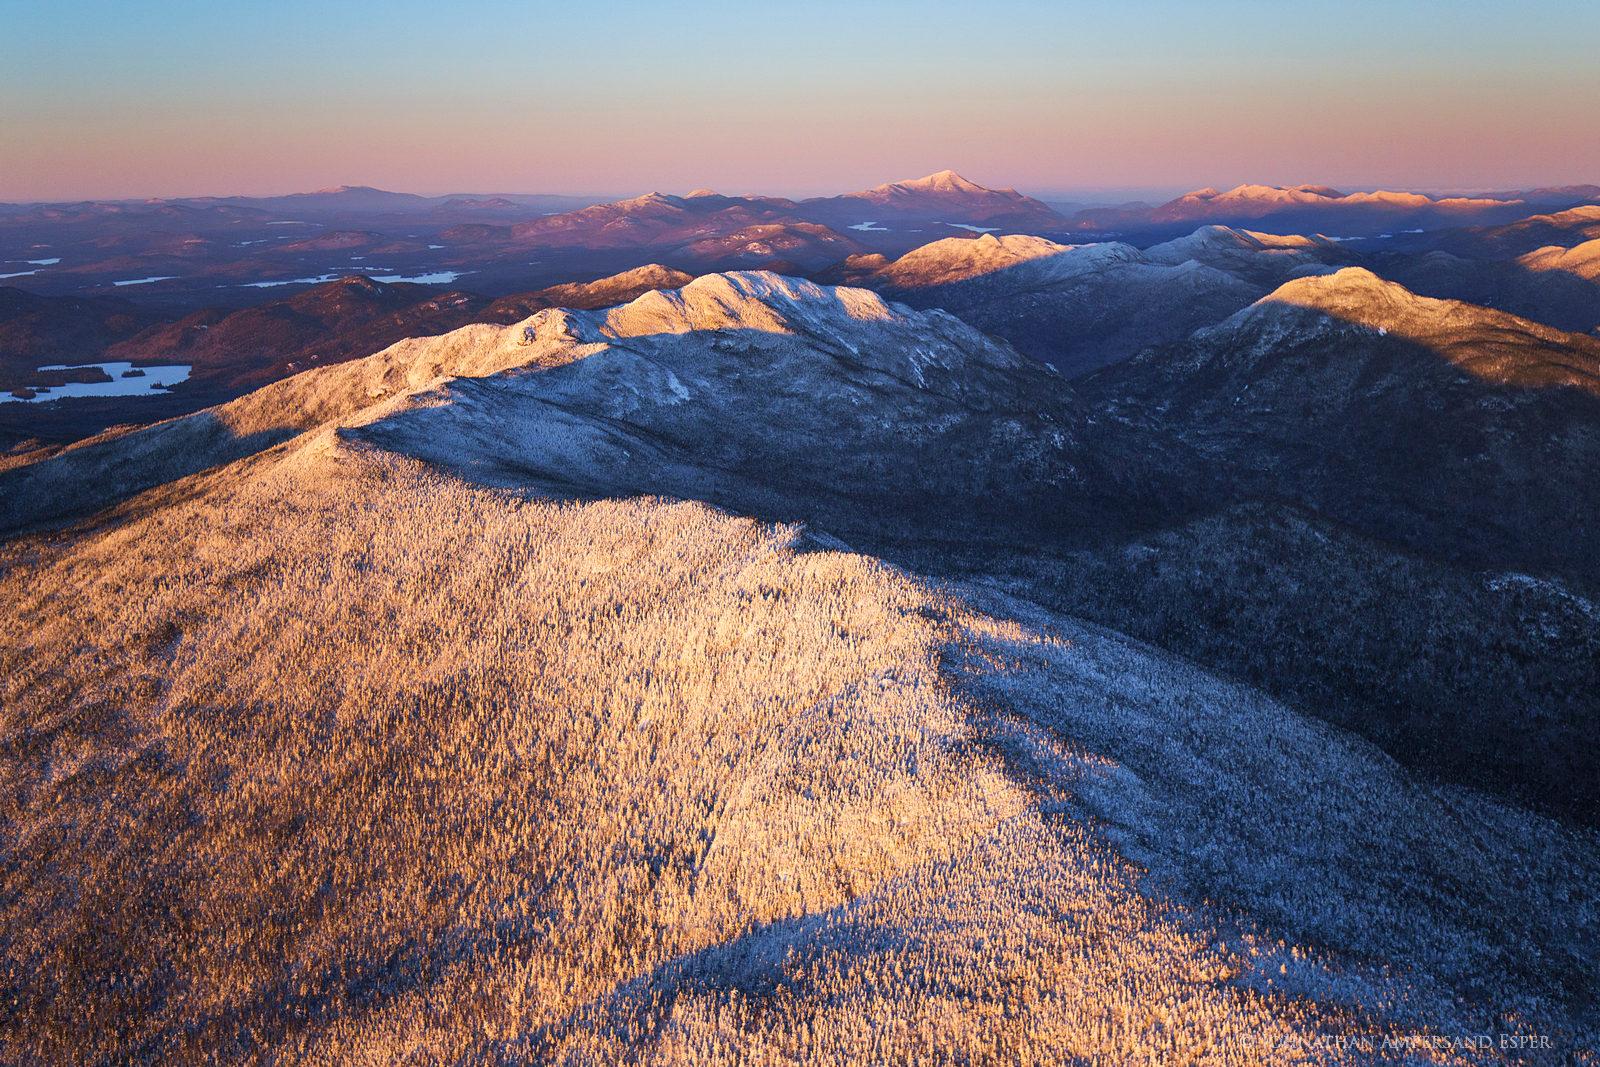 Seward Range,Seward Mt,aerial,winter,sunset,aerial winter,alpenglow,light,2016,Johnathan Esper,Donaldson,Emmons,, photo